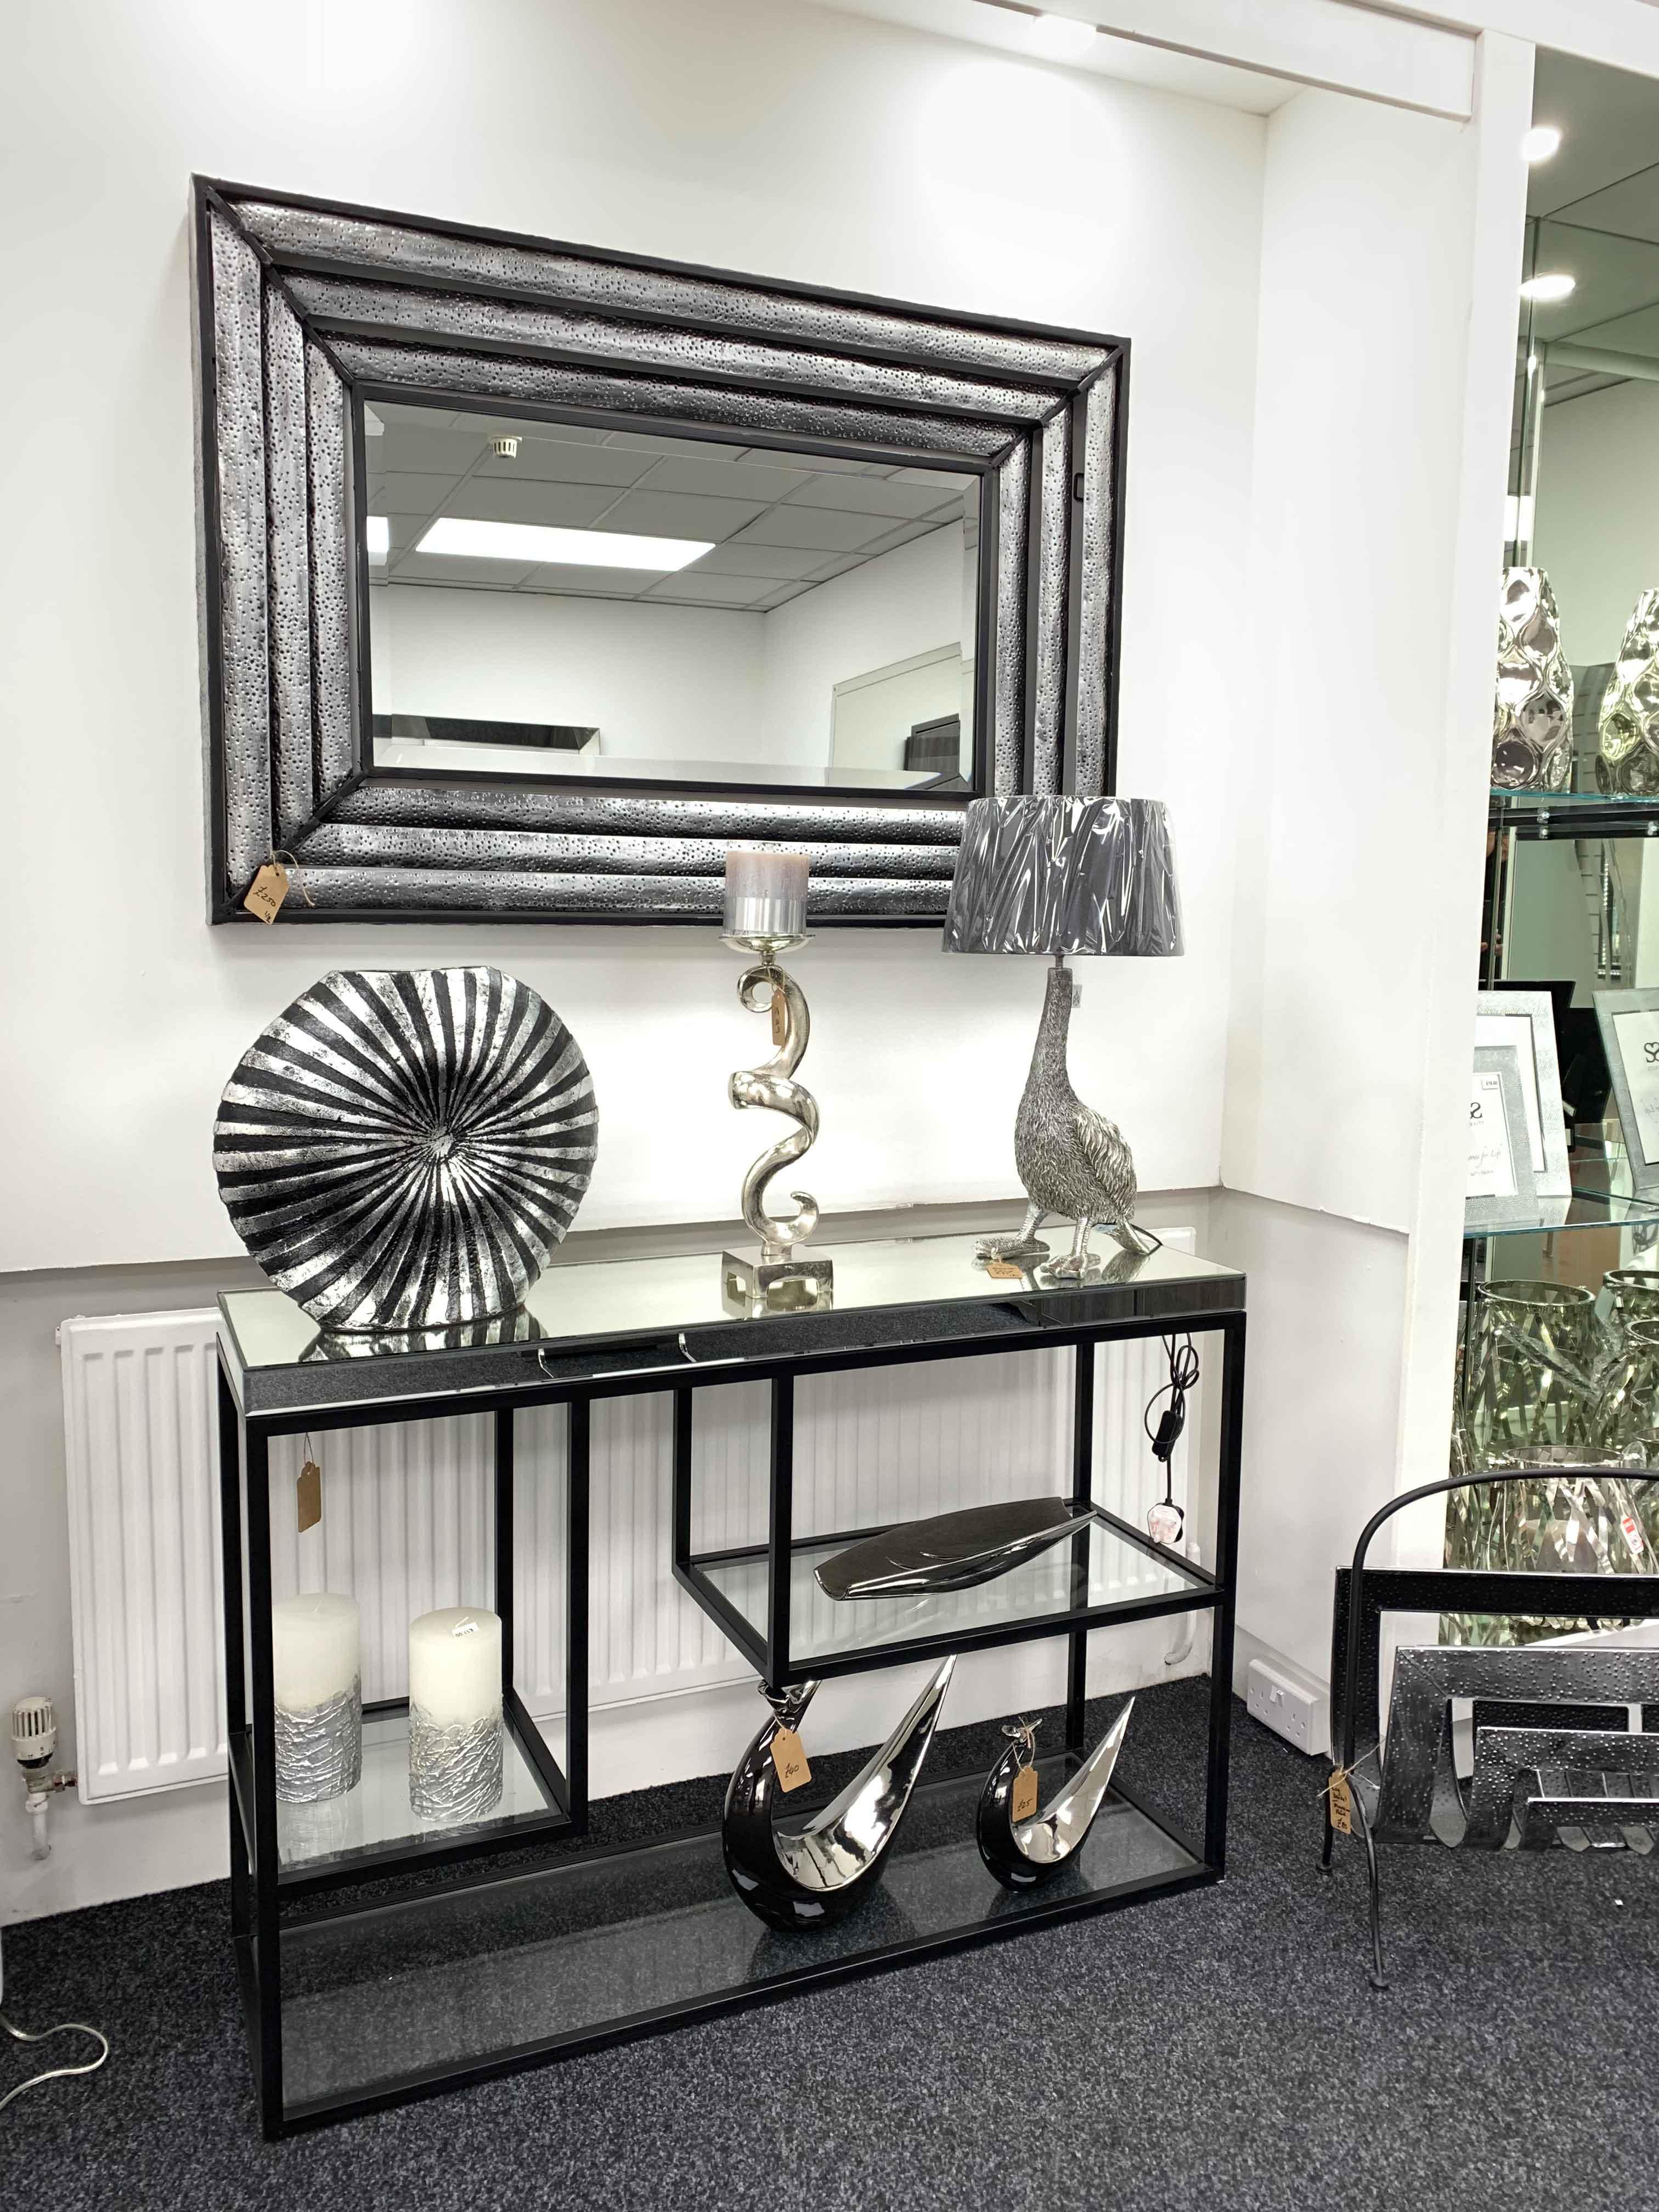 Furniture Showroom Hurry Bros Glassworks Glasgow